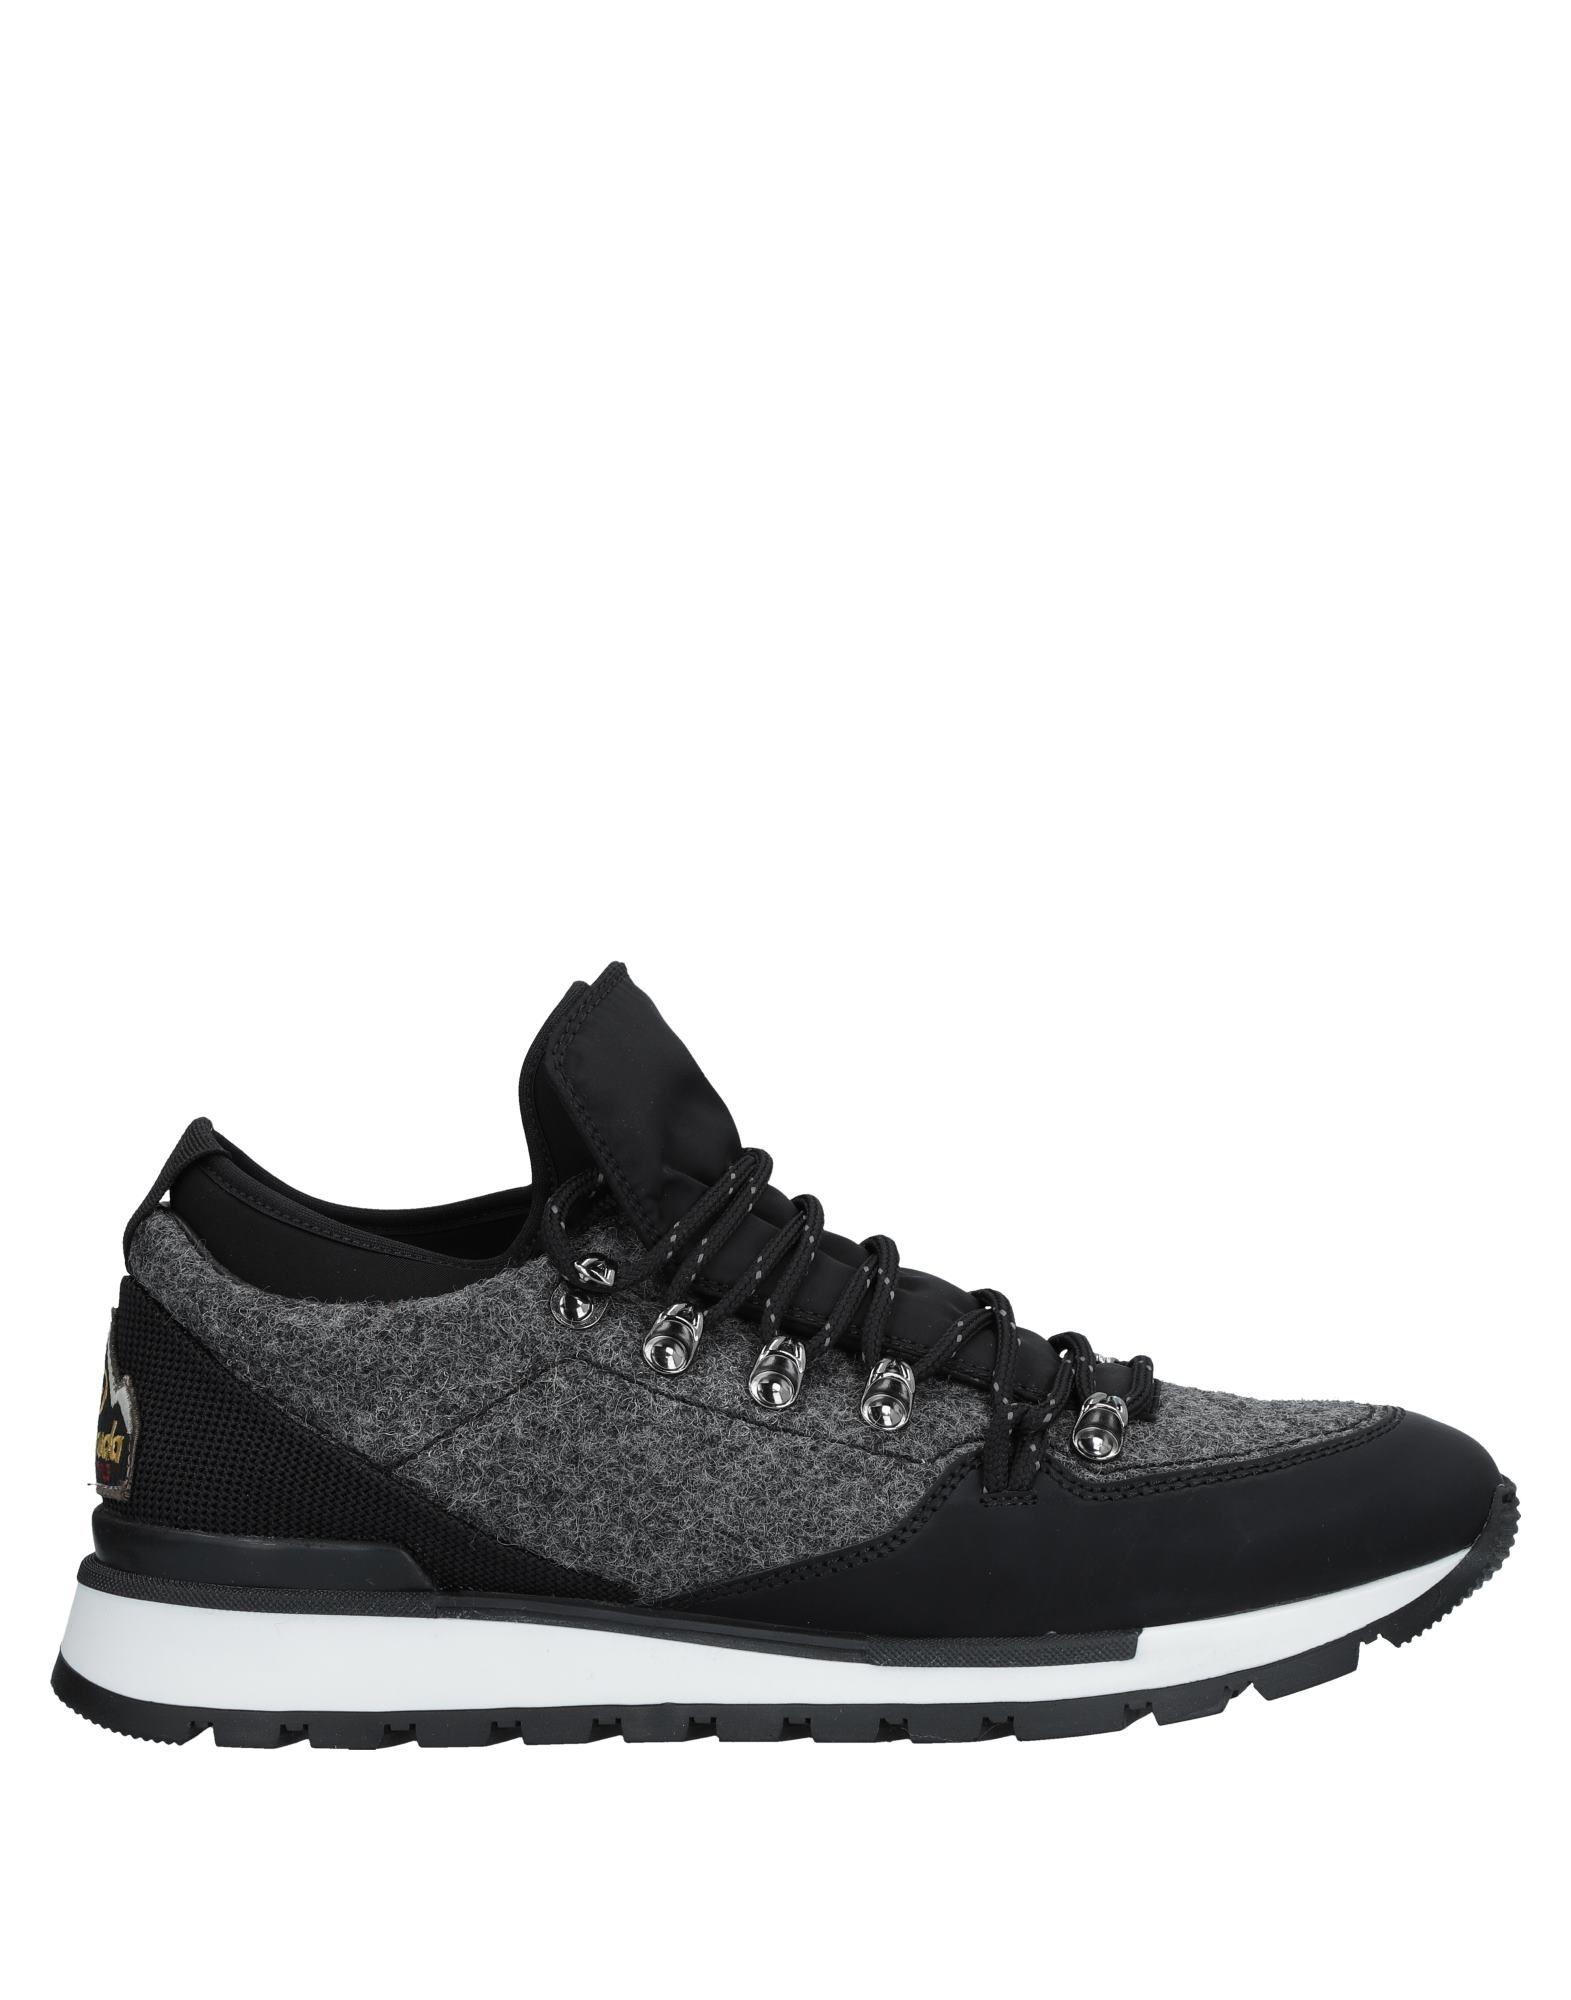 Barracuda Sneakers Herren  11532053DB Gute Qualität beliebte Schuhe